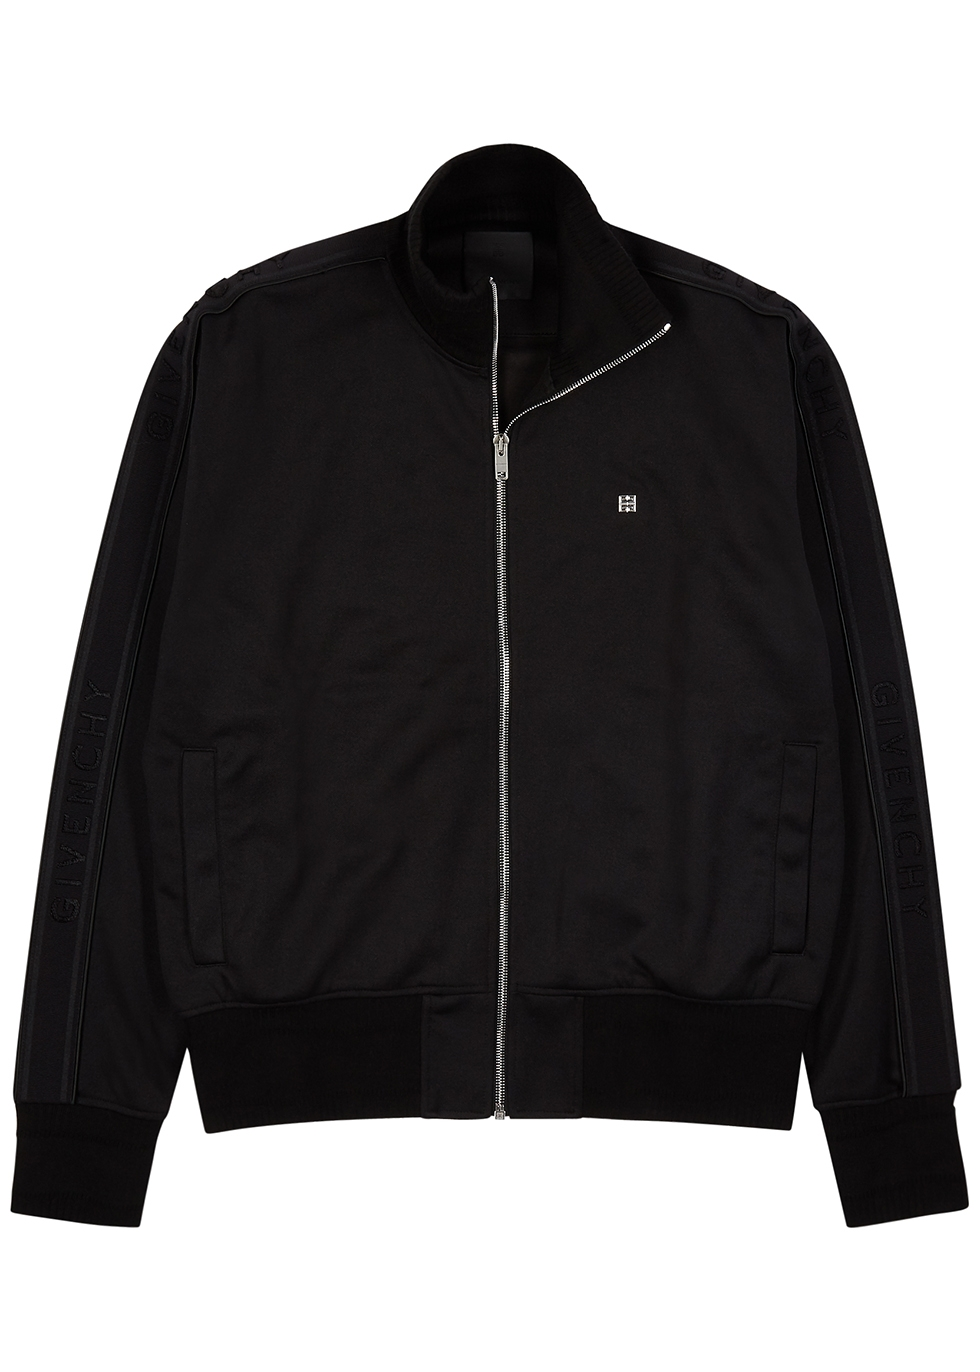 Black jersey track jacket